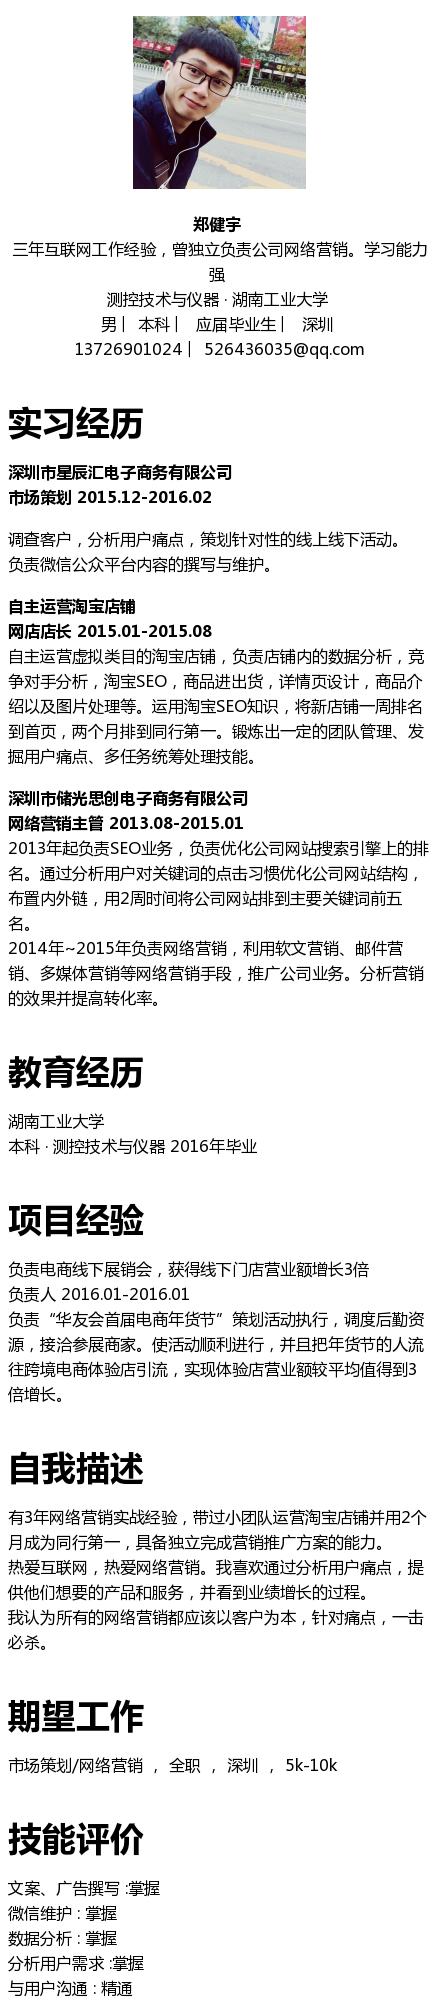 changweibo (2).JPG